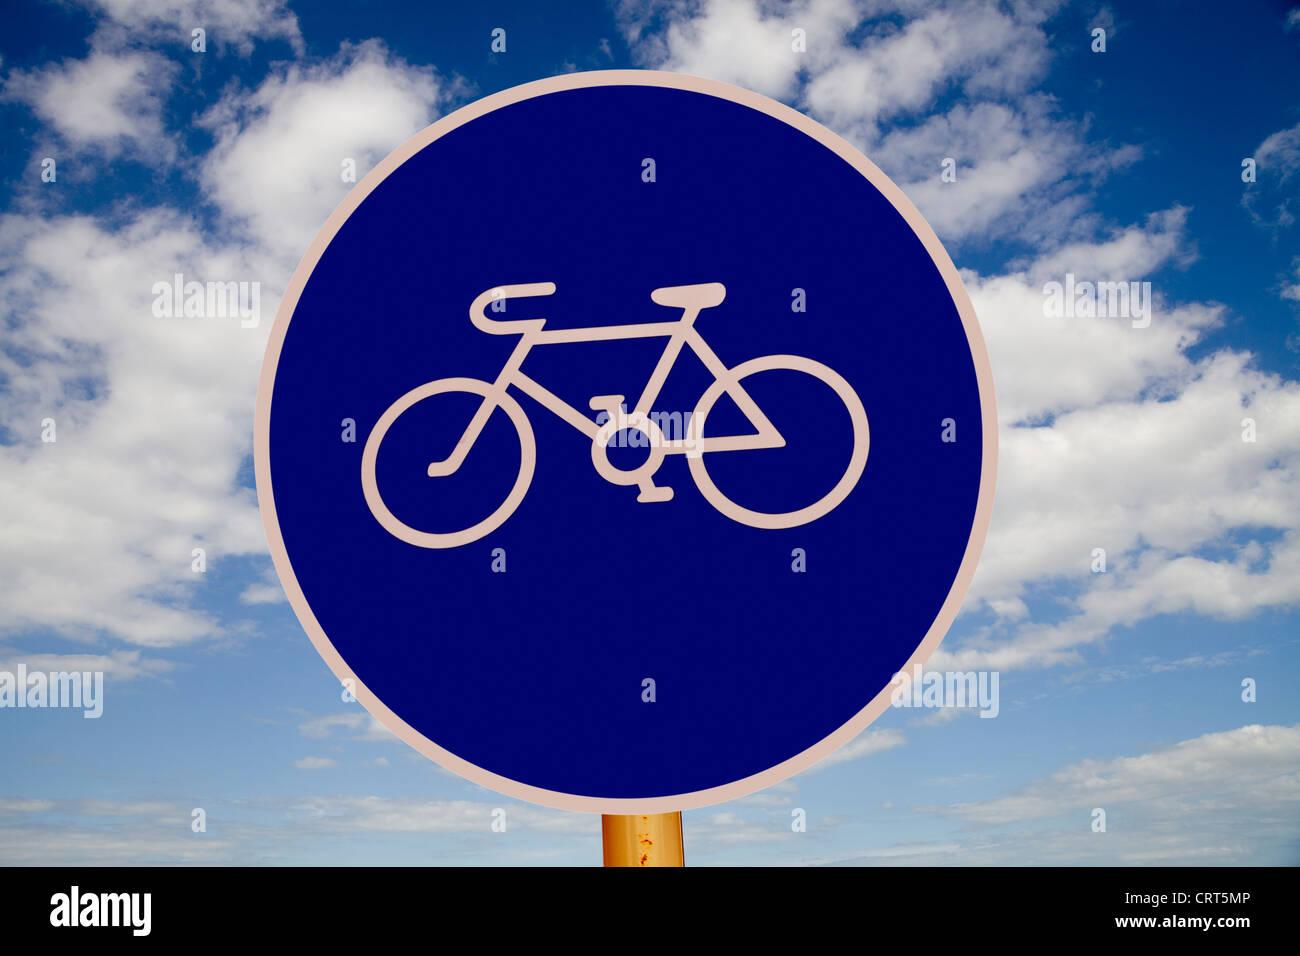 An urban cycle lane sign in Sofia, Bulgaria - Stock Image